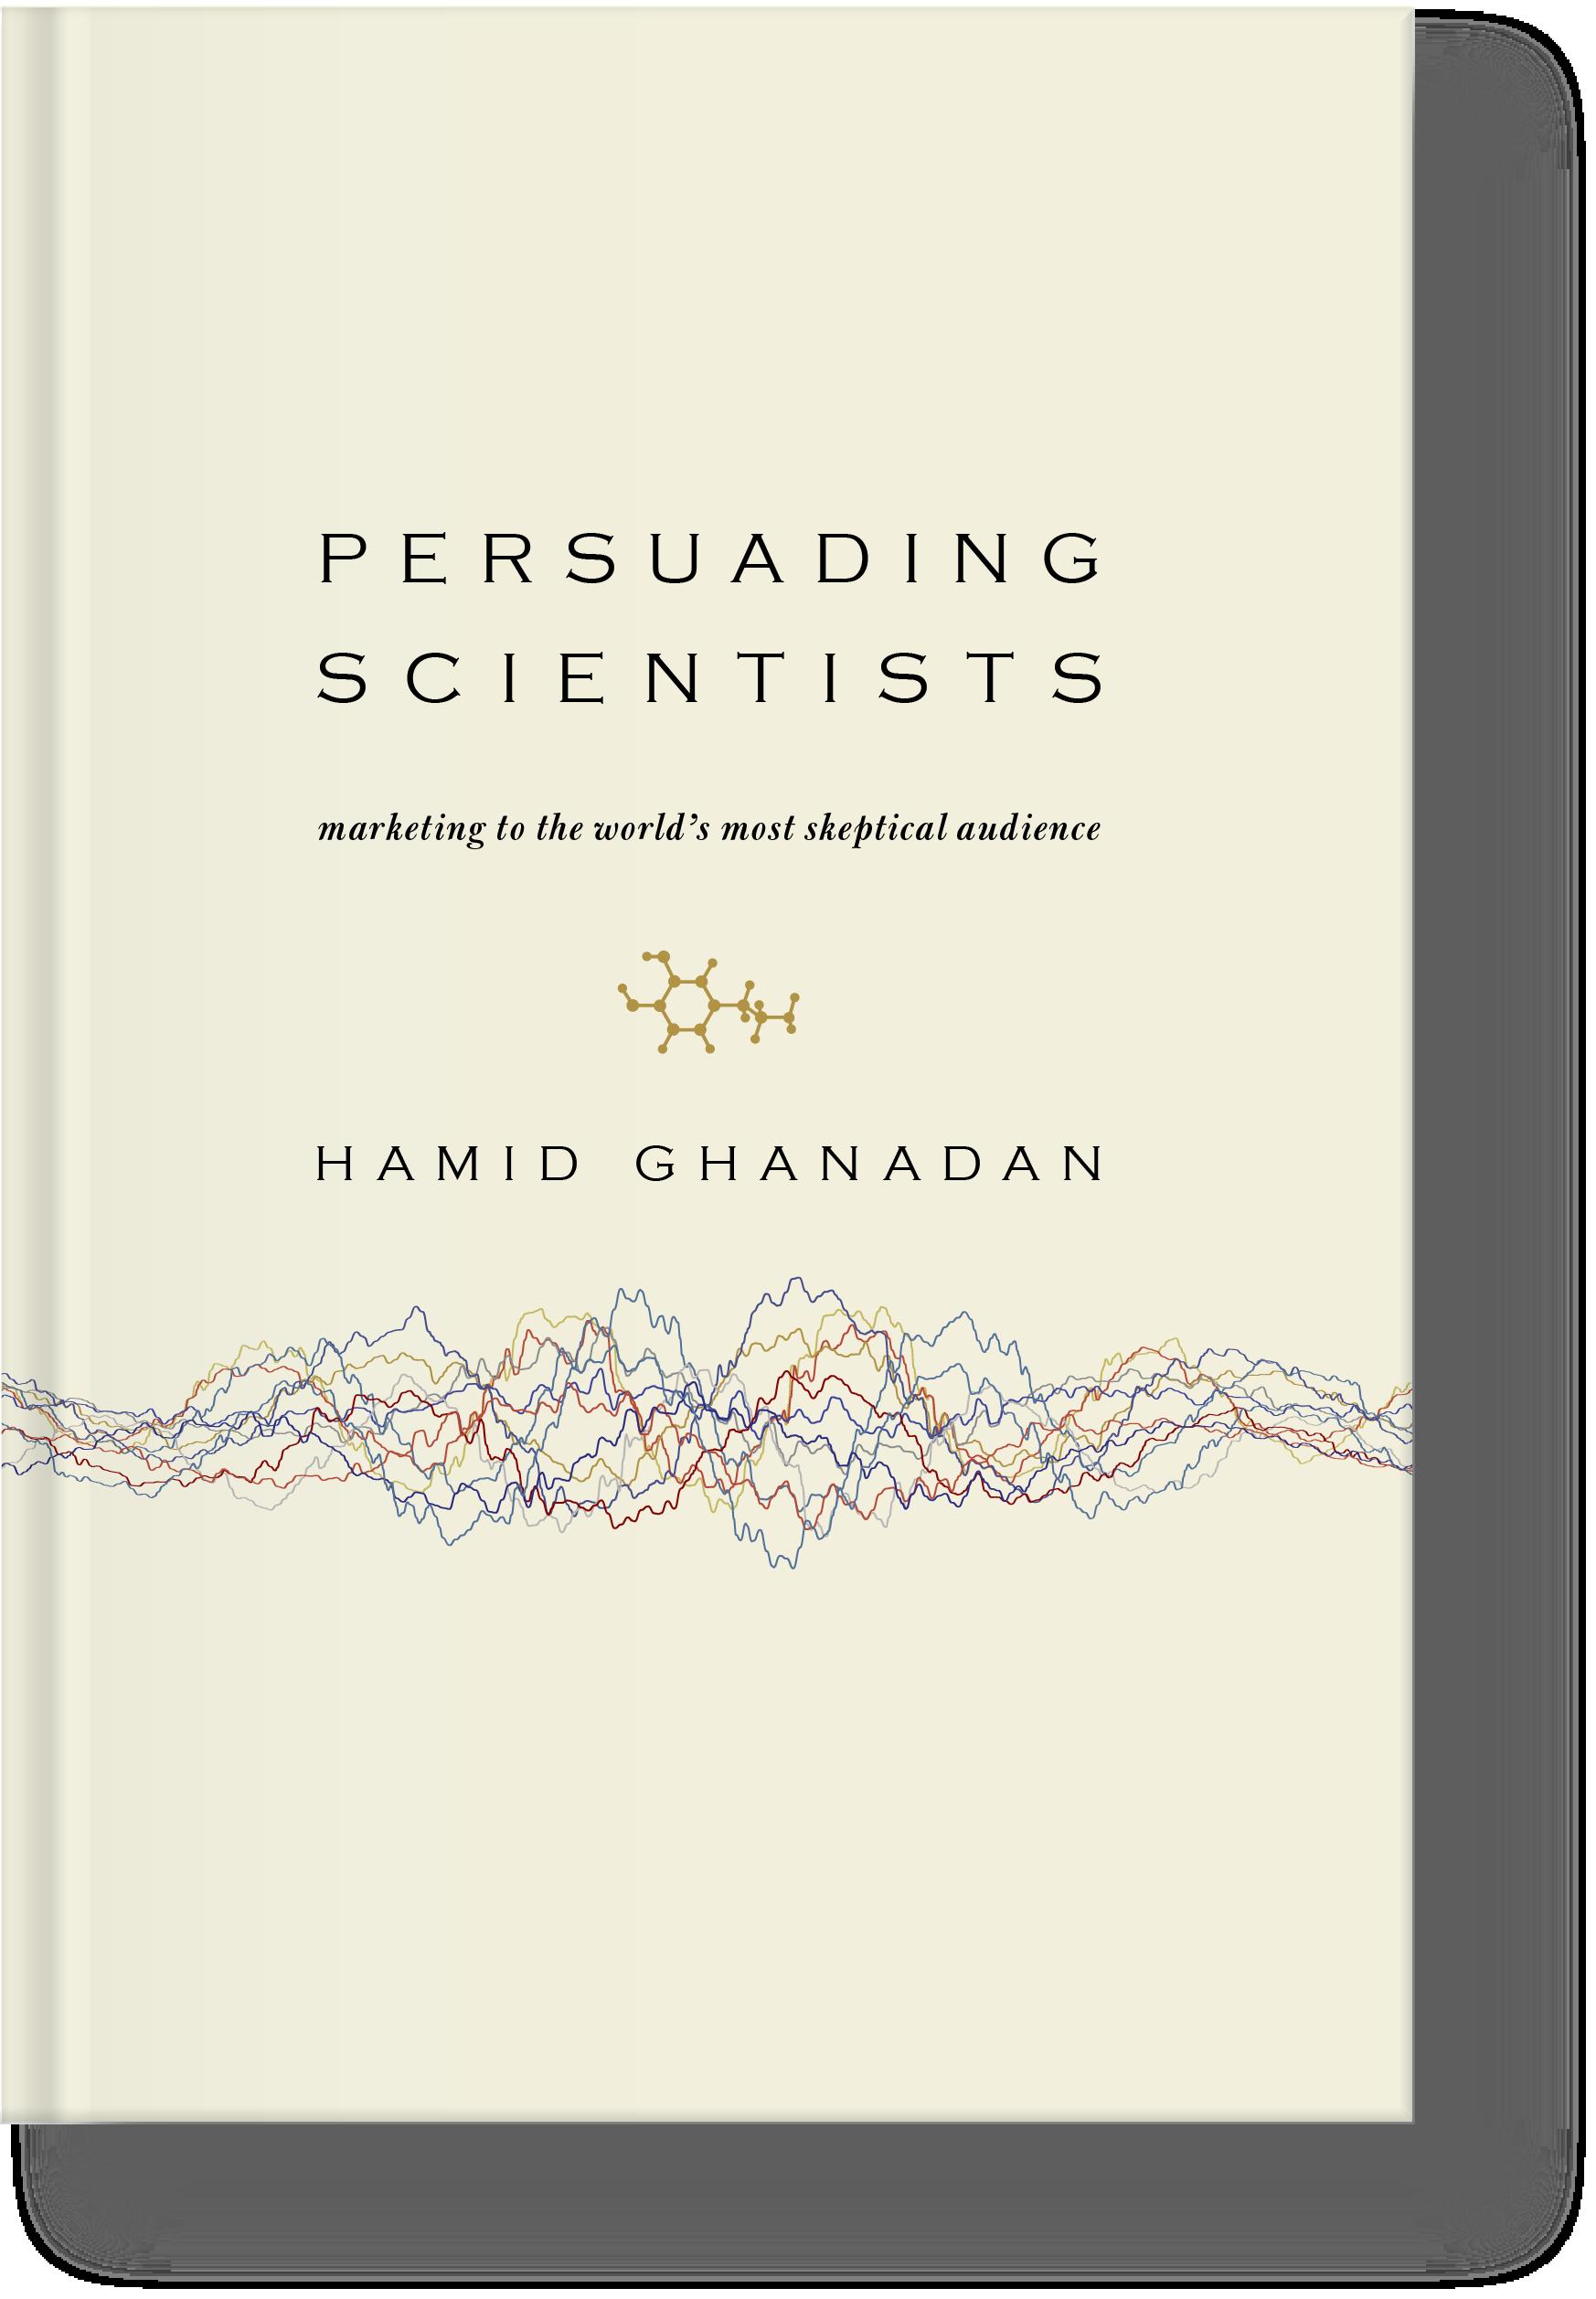 Persuading Scientists Book Linus Hamid Ghanadan